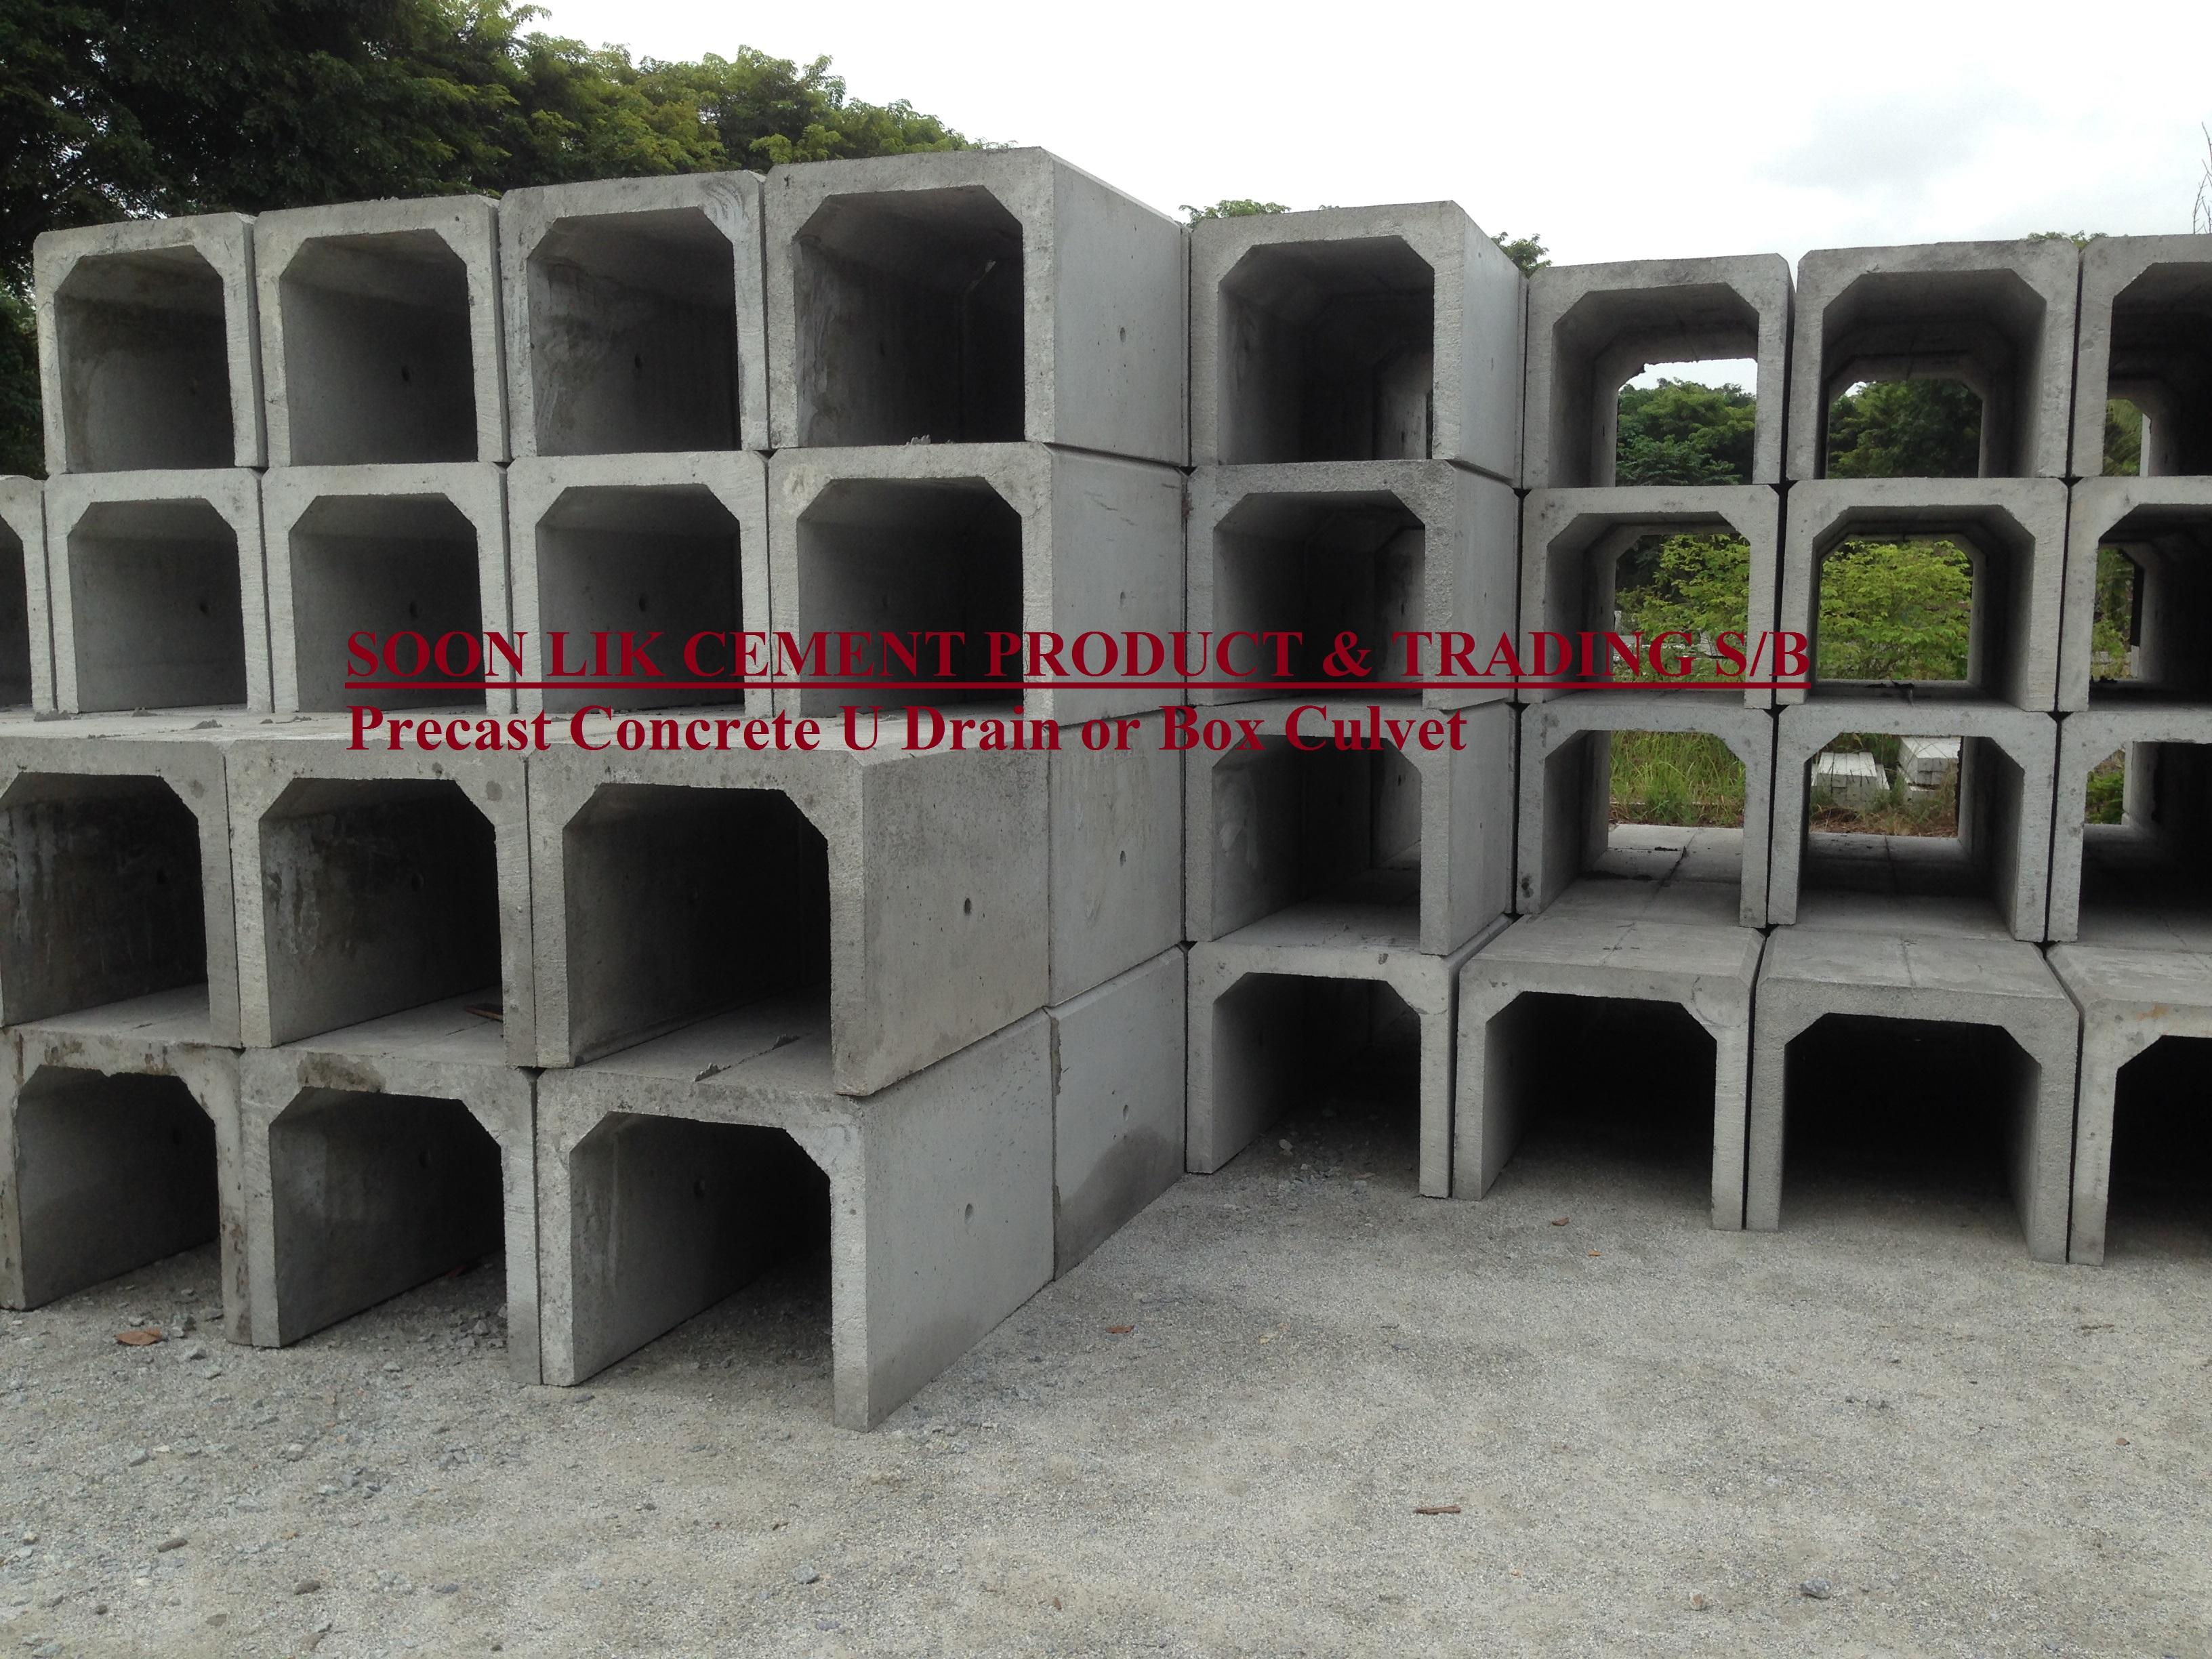 u drain/box culvert